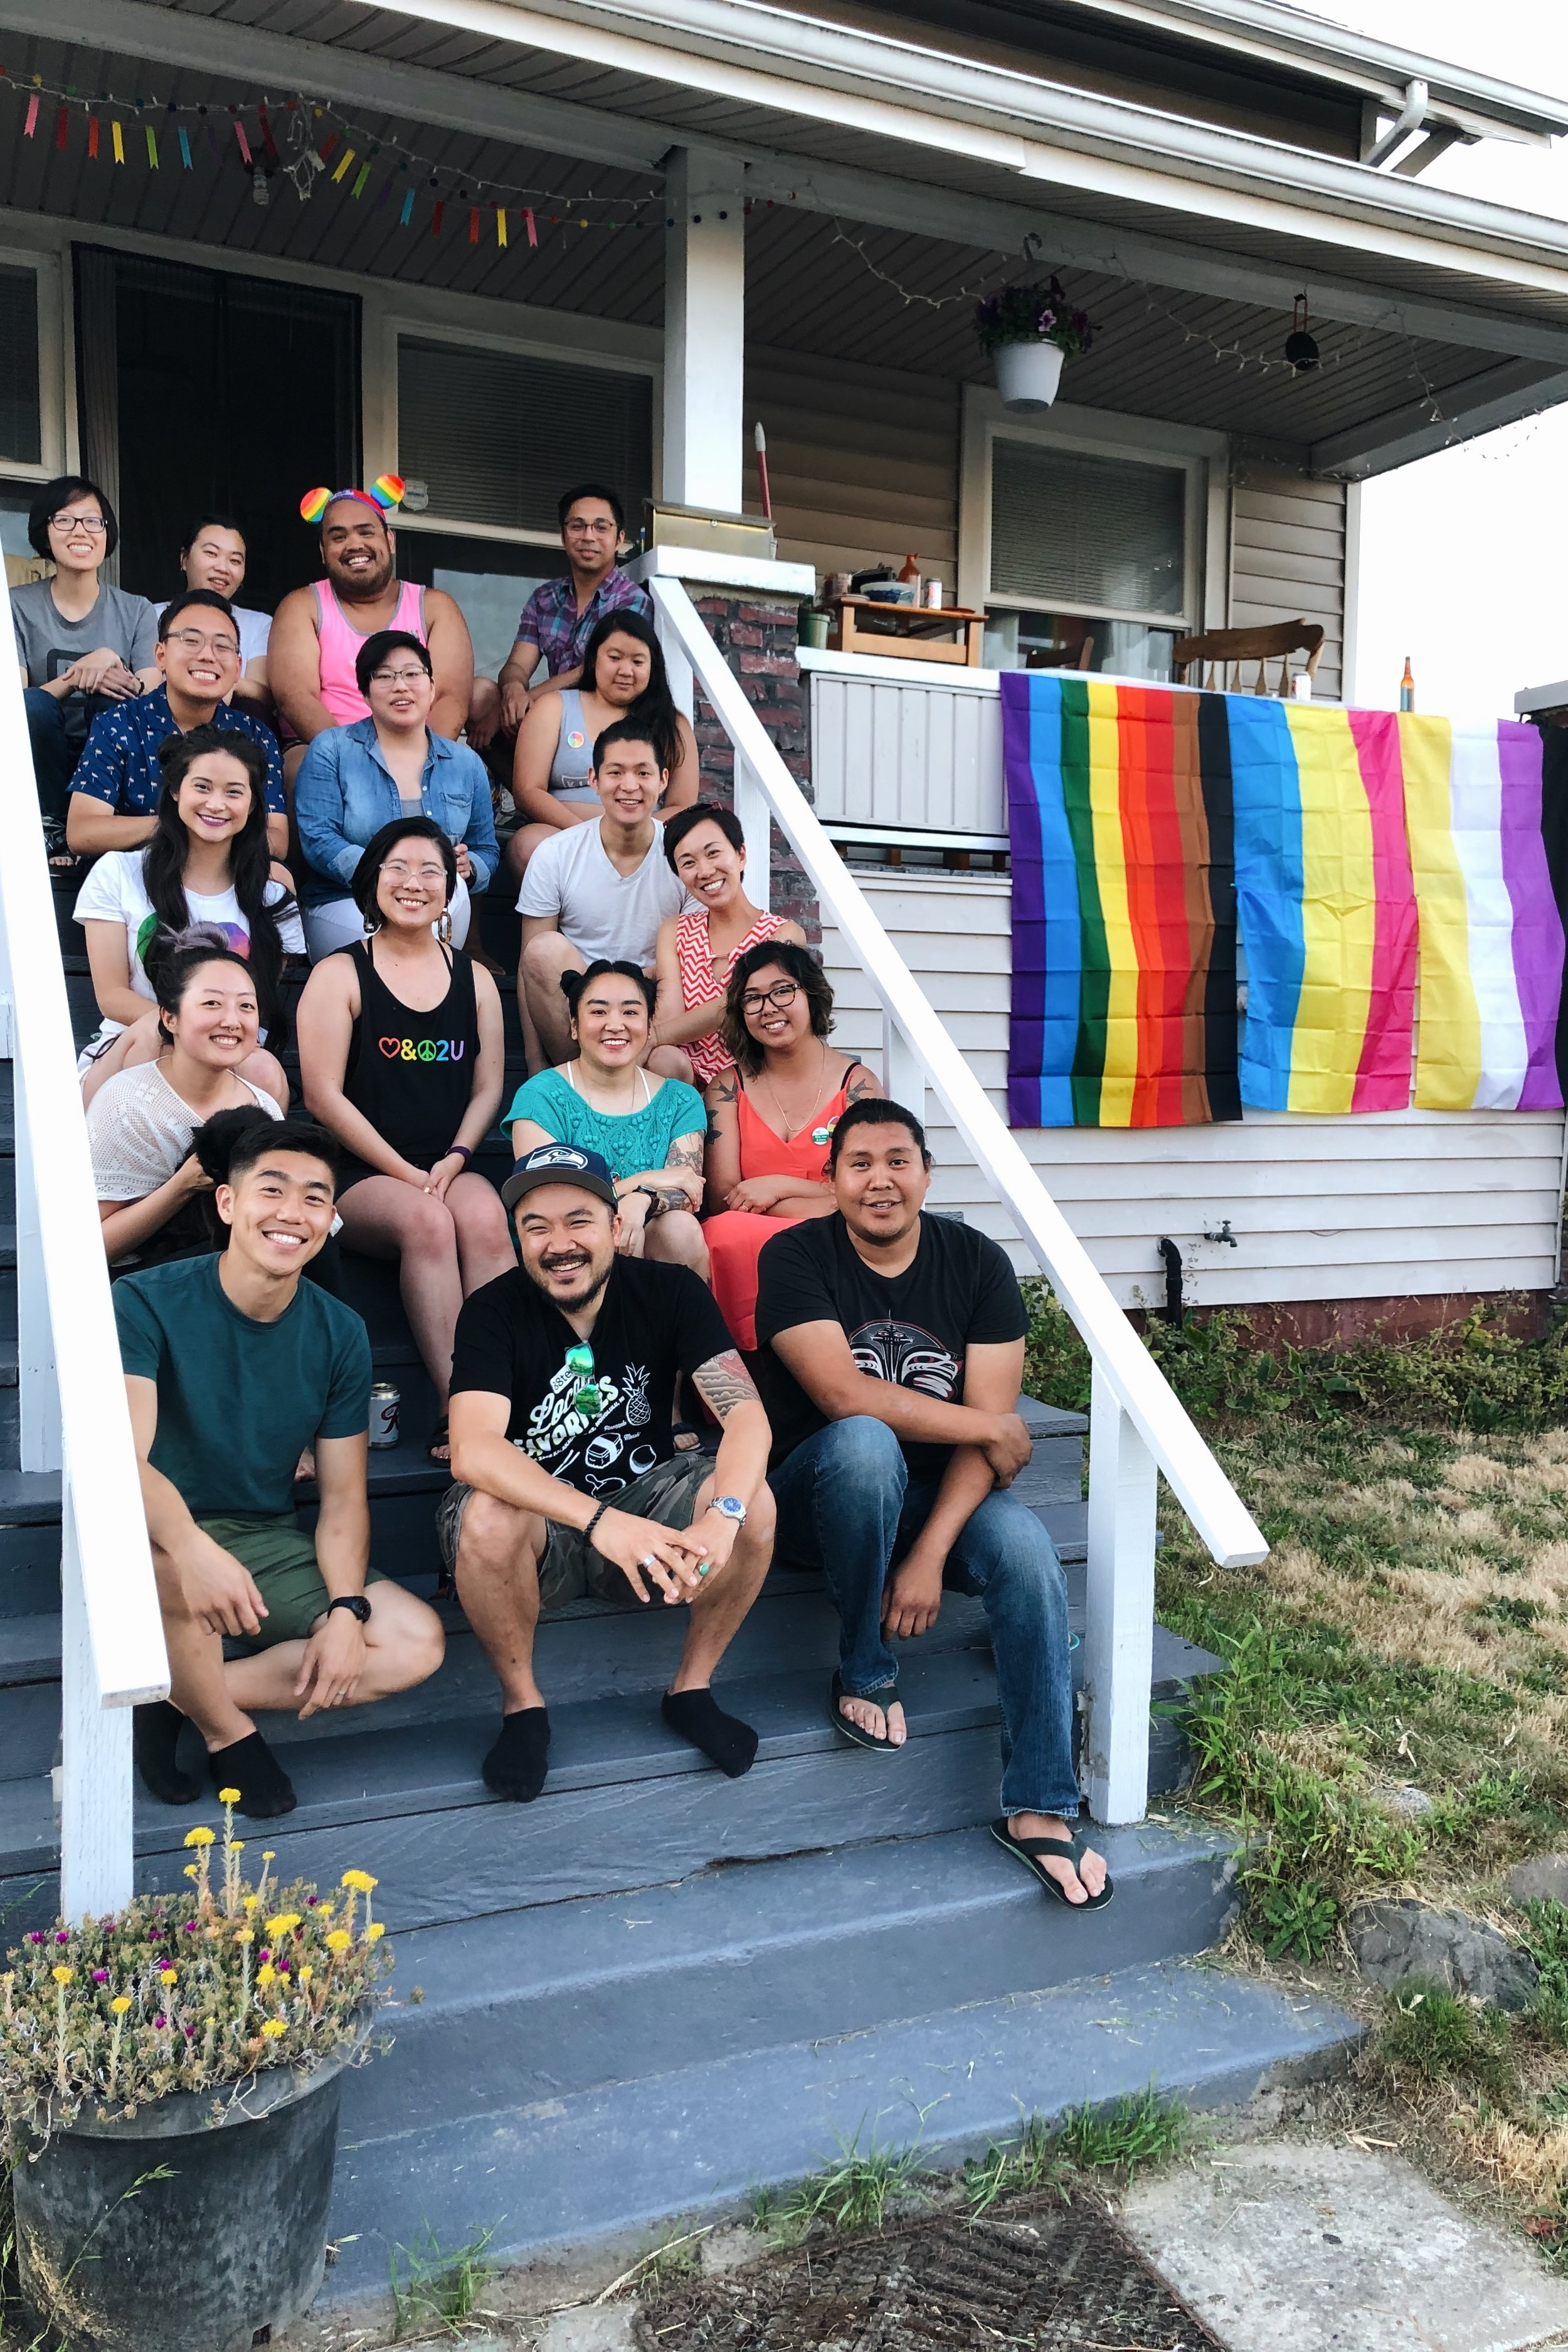 Celebrating Pride 2019 / Photo by Aaron Lesaca